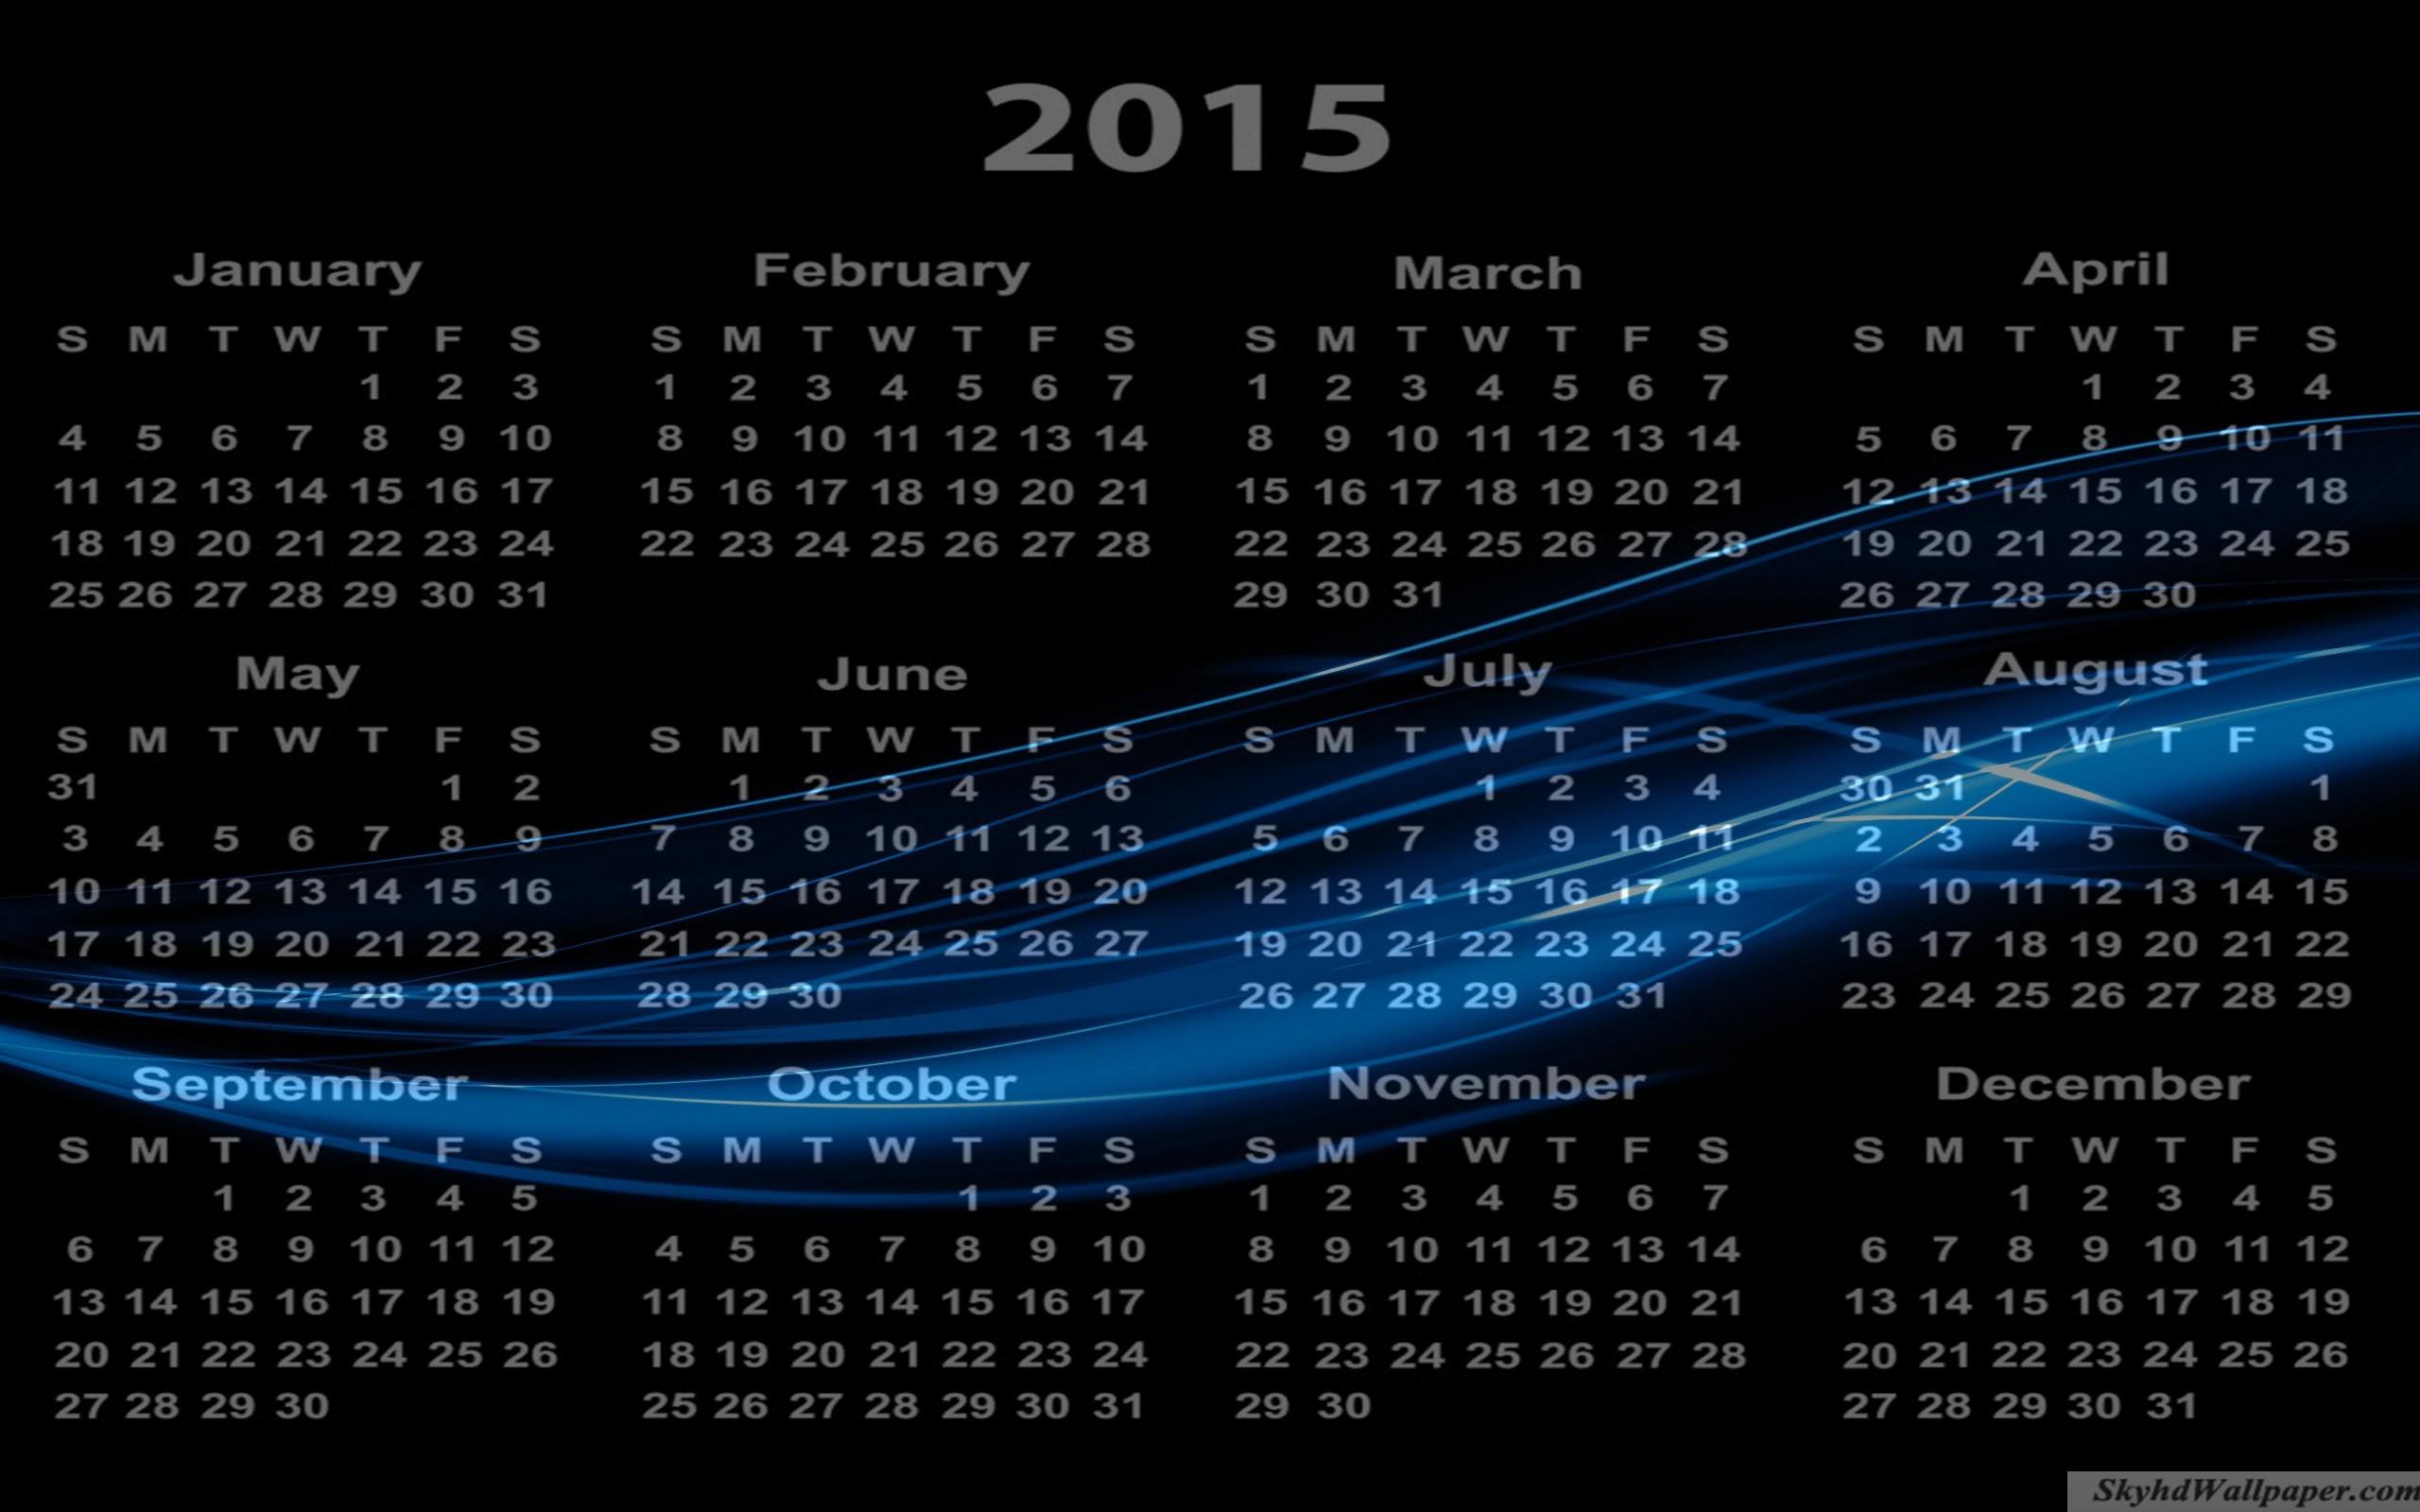 Calendario 2019 Editable Colombia Más Reciente 1000 About Calendar 2015 Kalender 2015 Free Wallpaperzen Of Calendario 2019 Editable Colombia Más Recientemente Liberado Of Calendarios 2017 Para Imprimir Rock Cafe